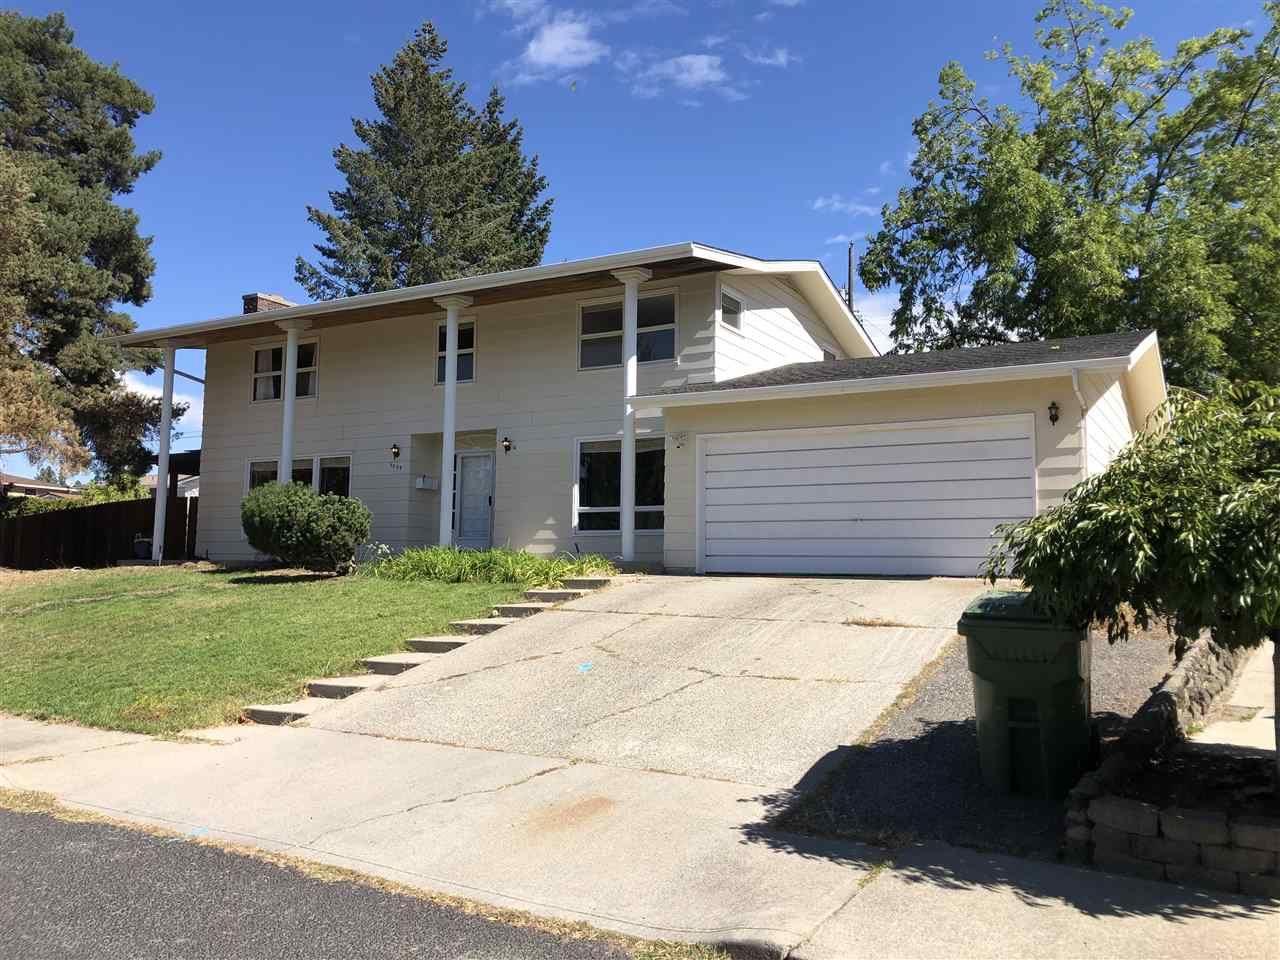 5544 N DRUMHELLER St, Spokane, WA 99205 - #: 202021819